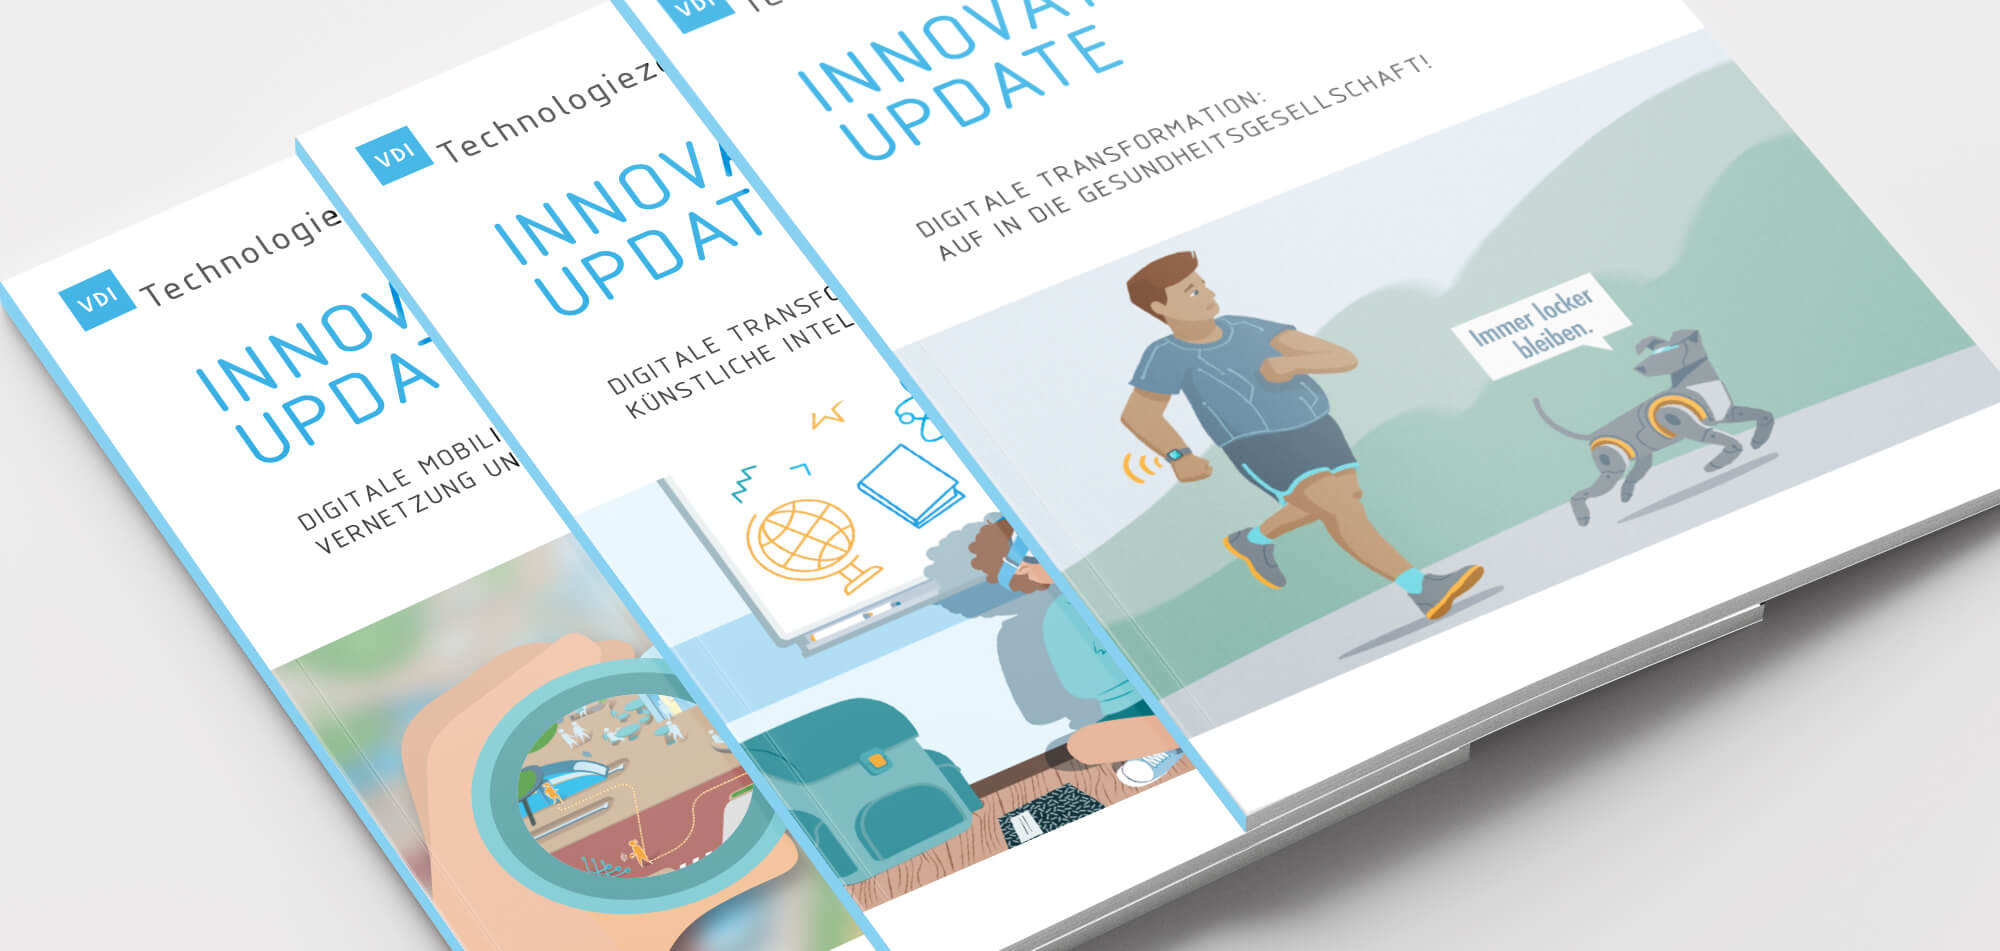 VDI Technologiezentrum Innovation Update Berlin Digitale Transformation KI